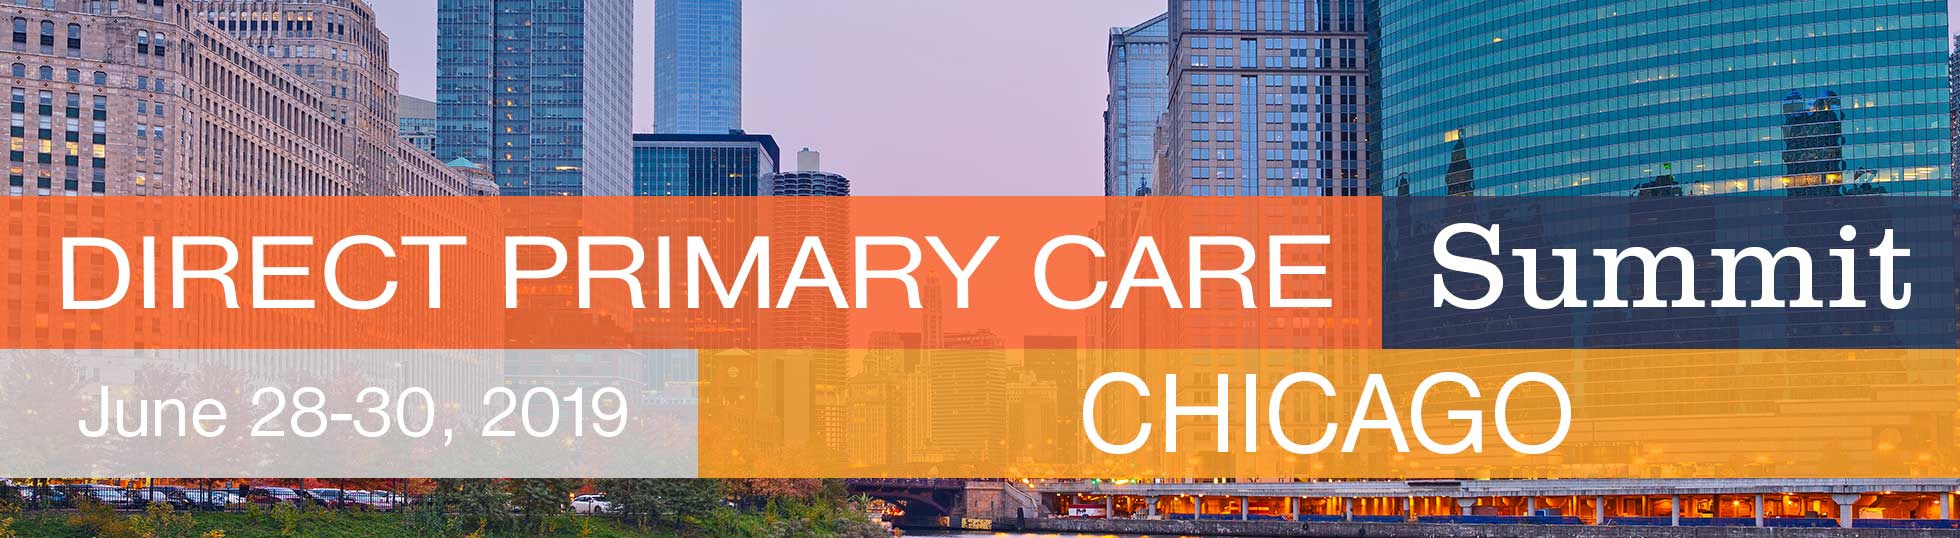 Direct Primary Care Summit, Chicago, June 28 - 30, 2019